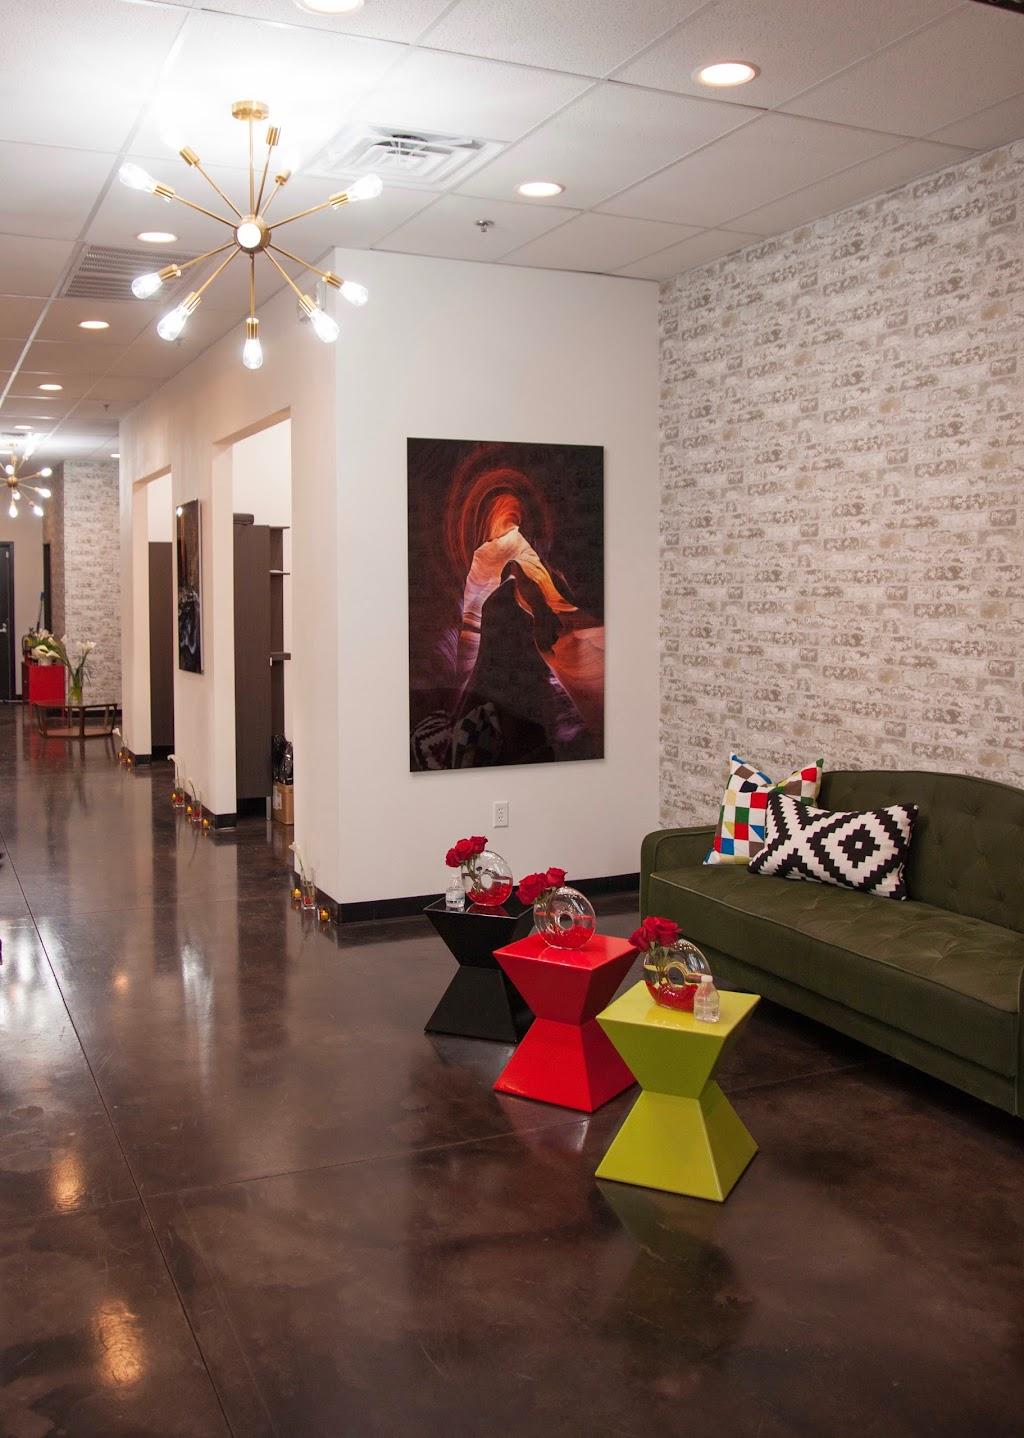 one 17 hair studios - hair care    Photo 9 of 10   Address: 7315 W Warm Springs Rd, Las Vegas, NV 89113, USA   Phone: (702) 496-5778